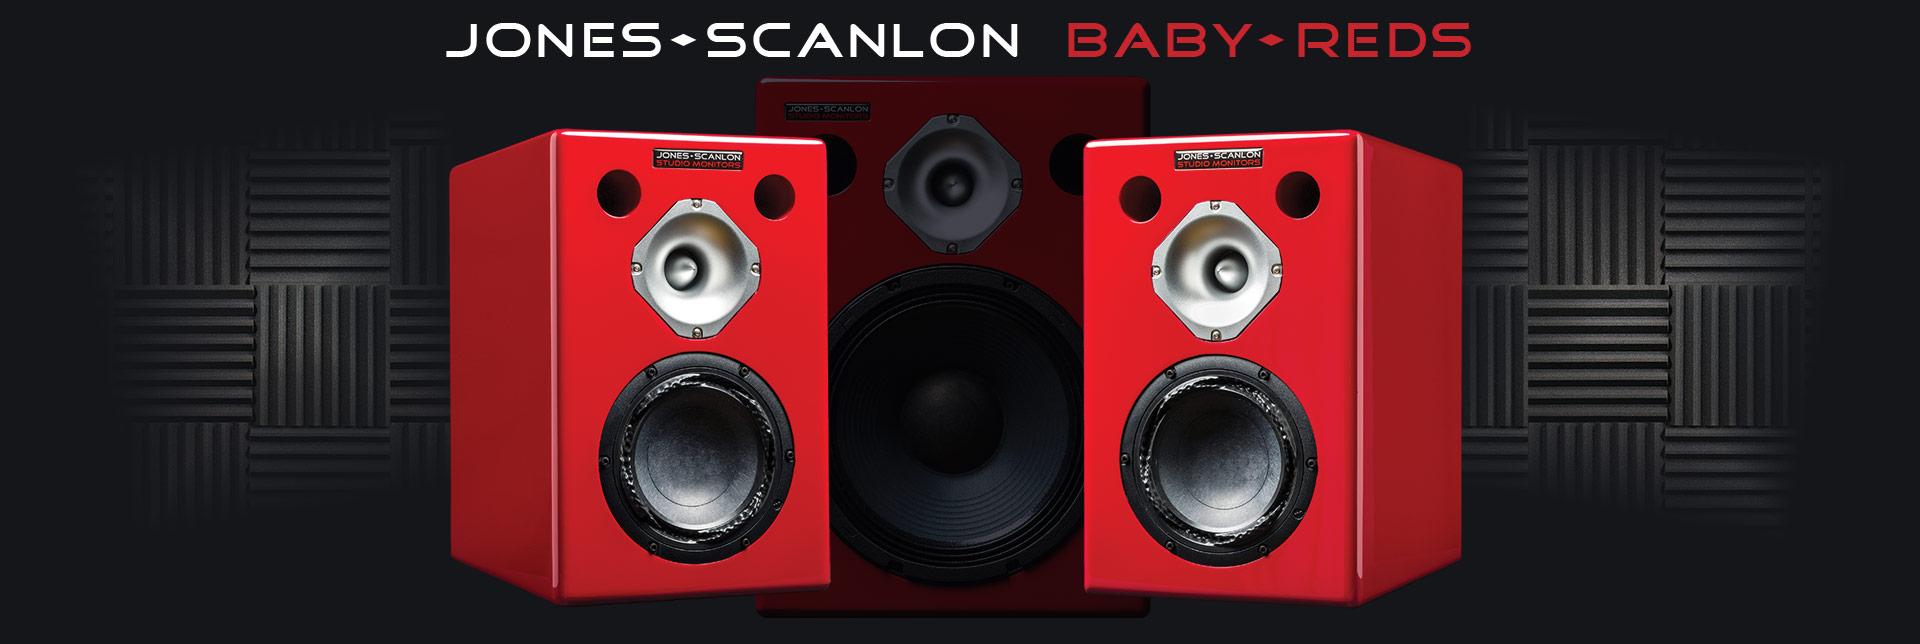 Jones-Scanlon Baby Reds studio monitors - recording engineering, audio and film post production, sound track mastering, audio mixing, sound mixing, recording studio gear.